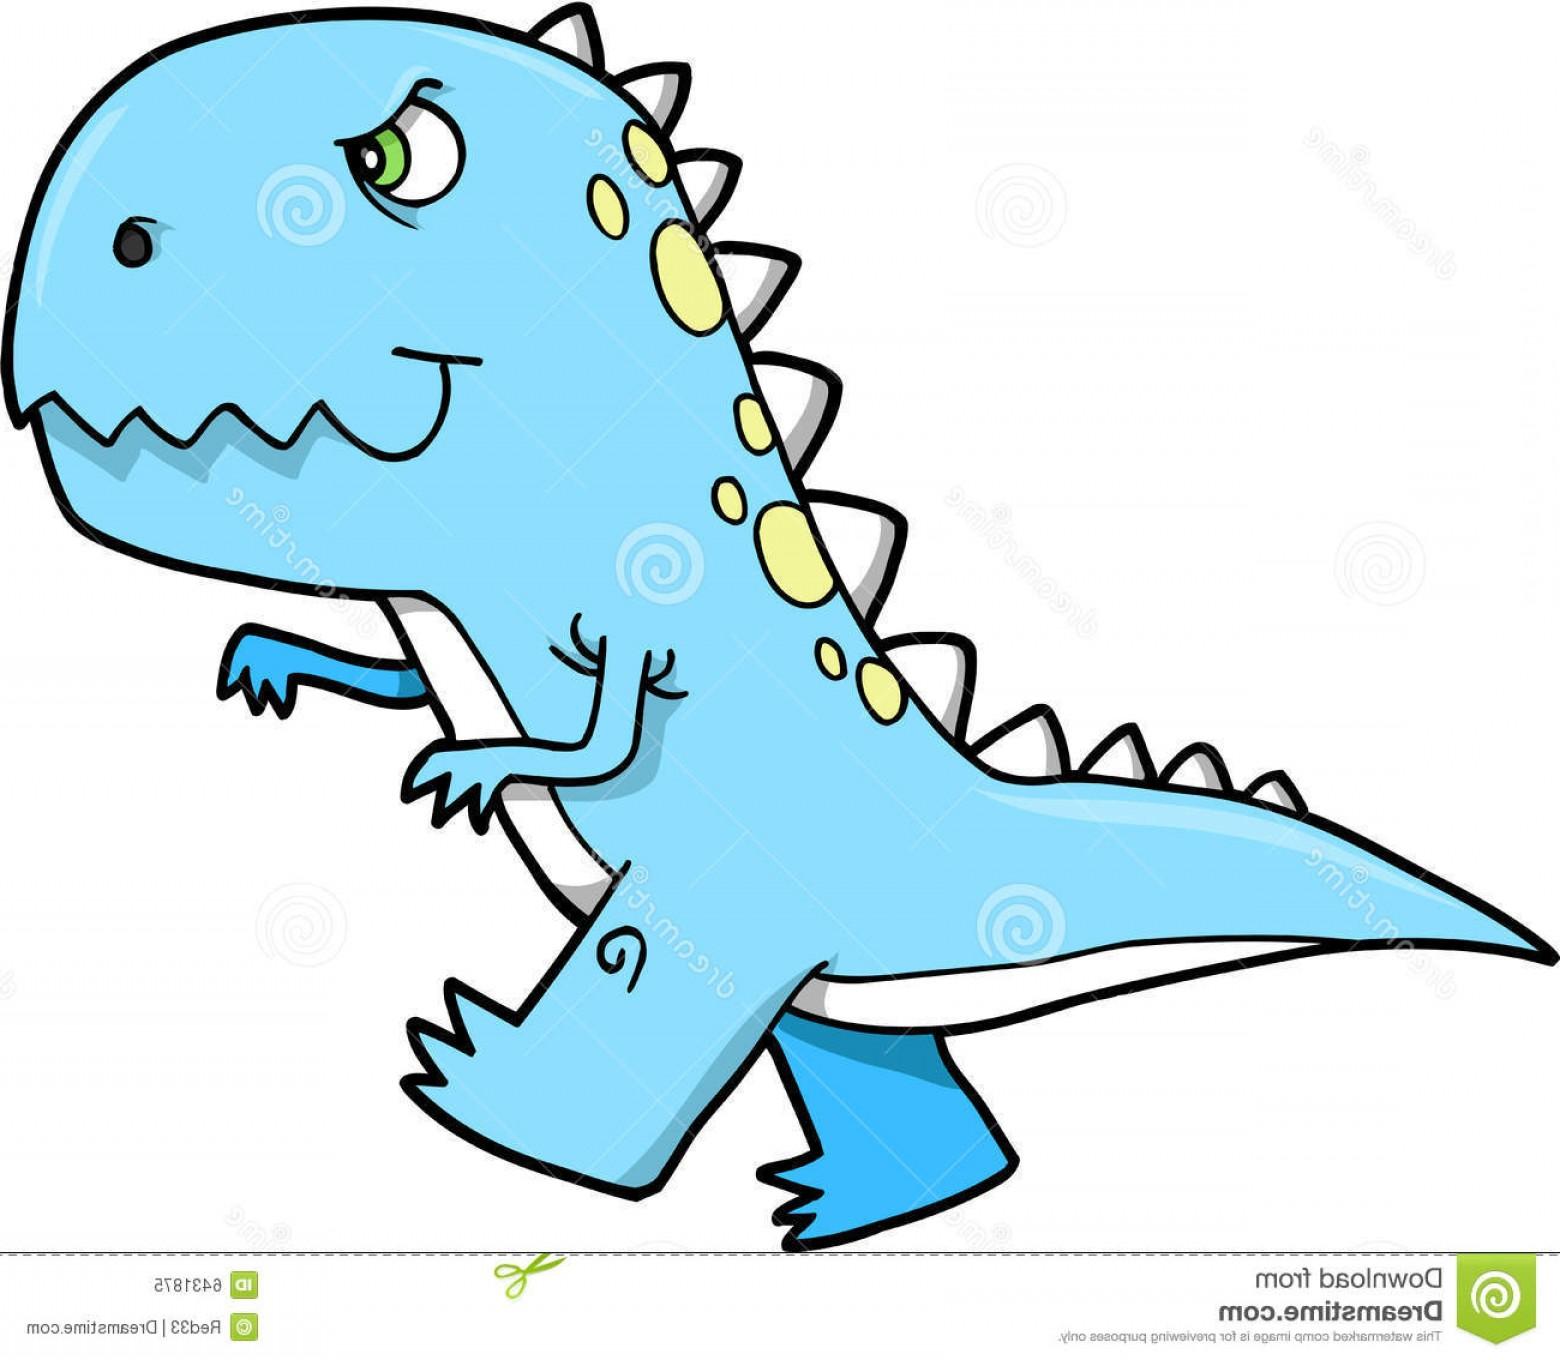 1560x1360 Royalty Free Stock Photo T Rex Dinosaur Vector Image Arenawp